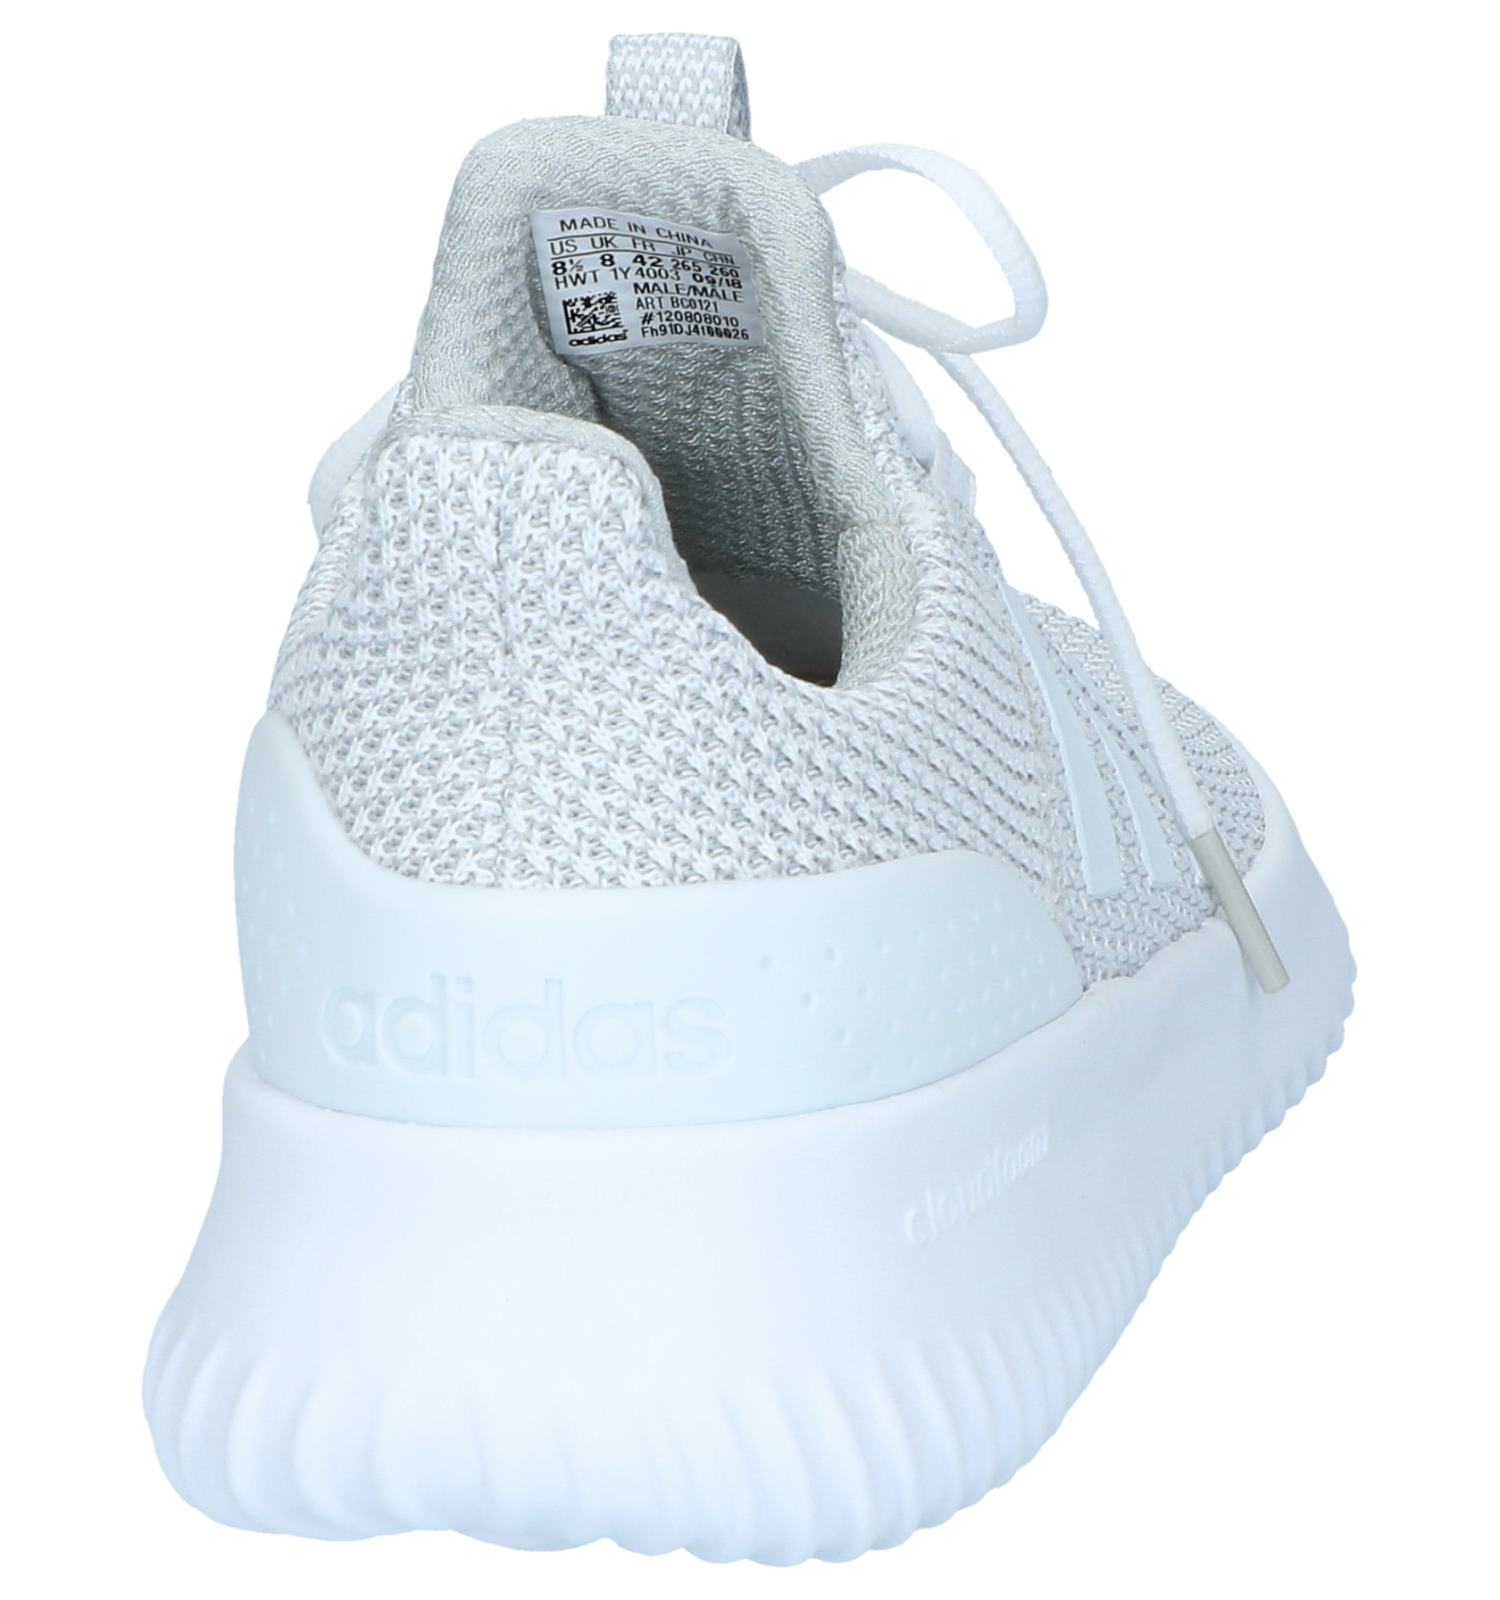 Witte Slip on Sneakers adidas Cloudfoam Ultimate